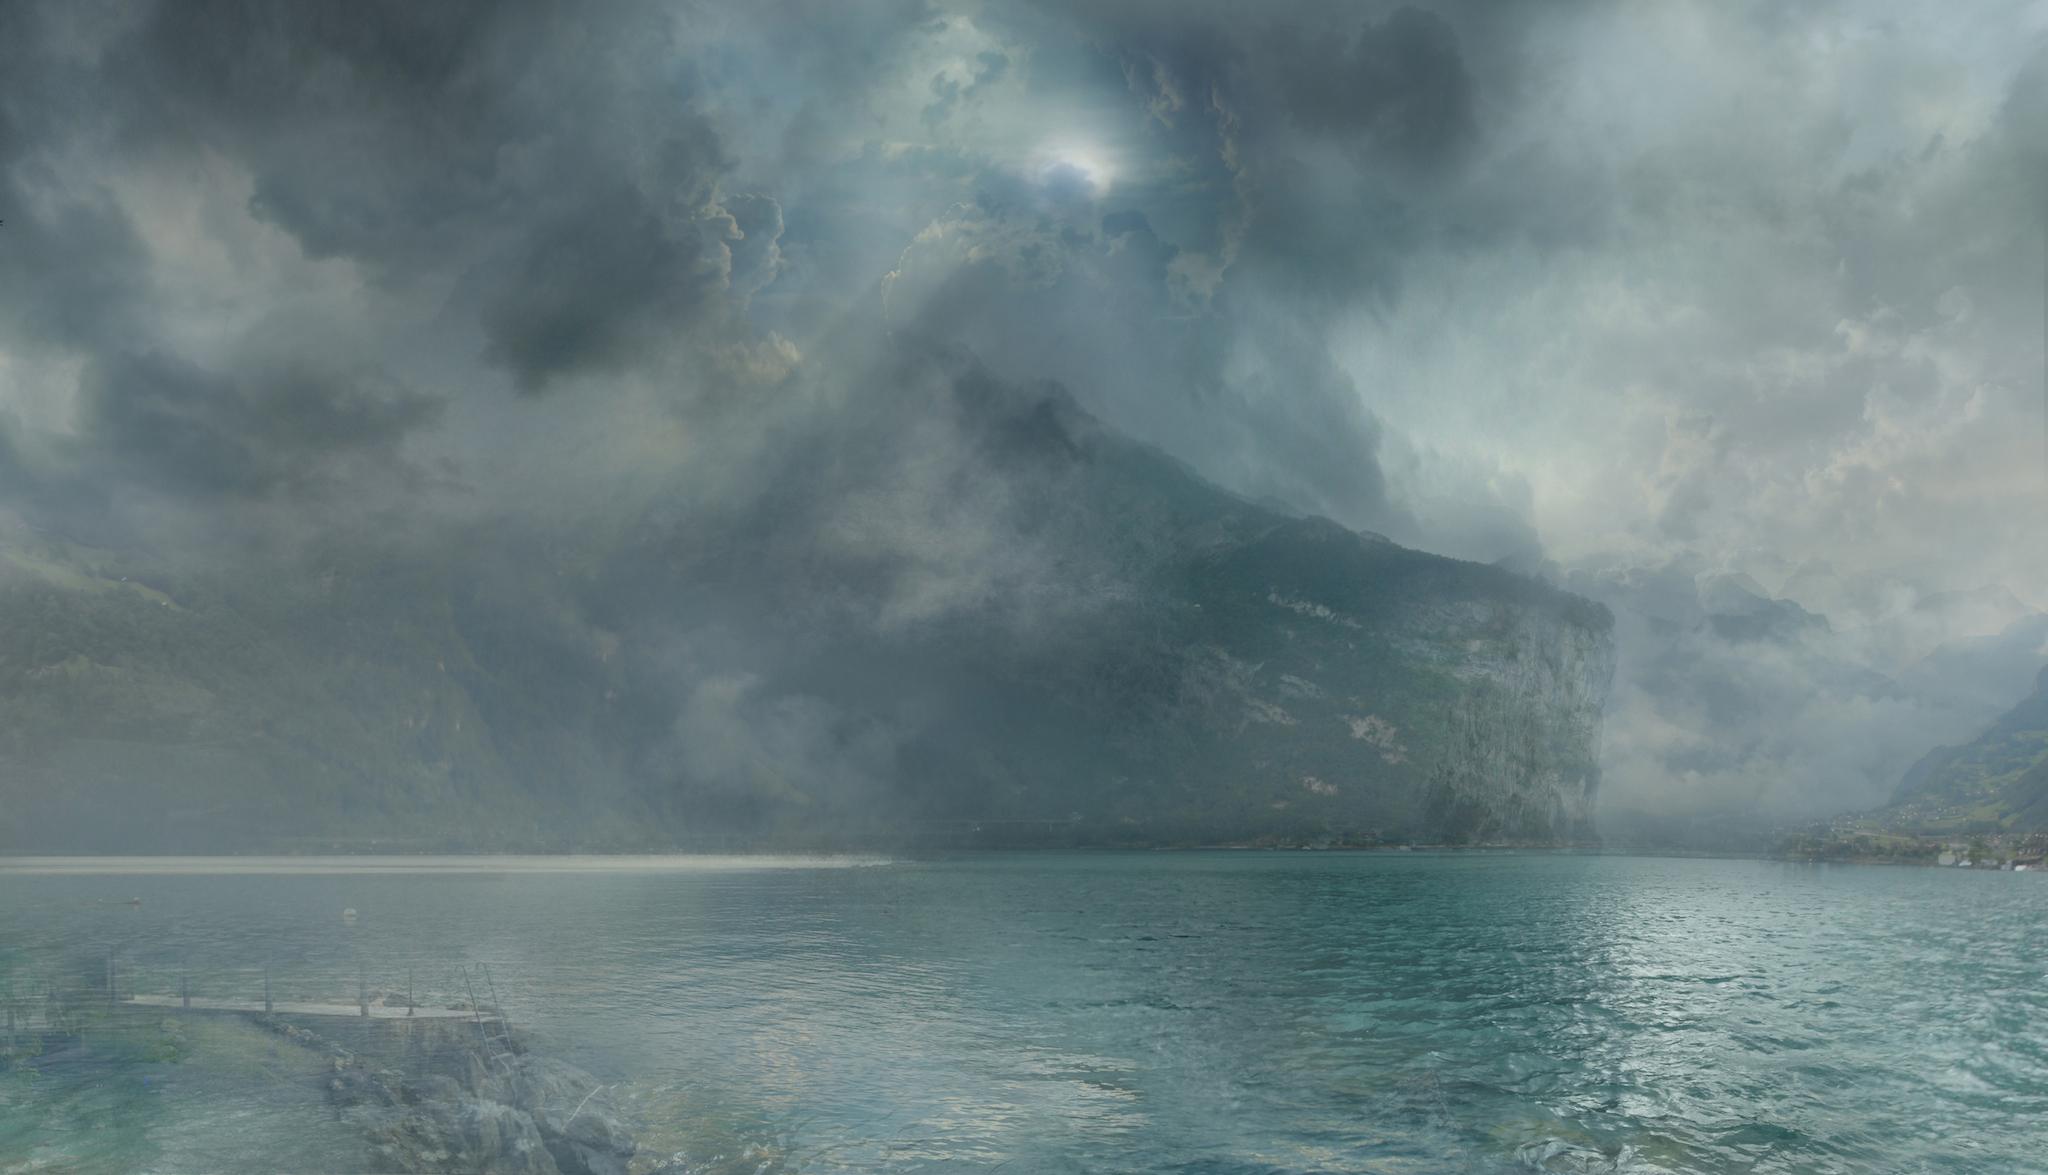 "Hiroyuki Masuyama nach J. M. W. Turner ""On the Lucerne looking towards Fluelen 1841"", 2014 Diasec LED Lightbox Auflage 5 + 1AP, 29 x 48 x 4cm / Courtesy: Galerie Rothamel Erfurt, Frankfurt M."